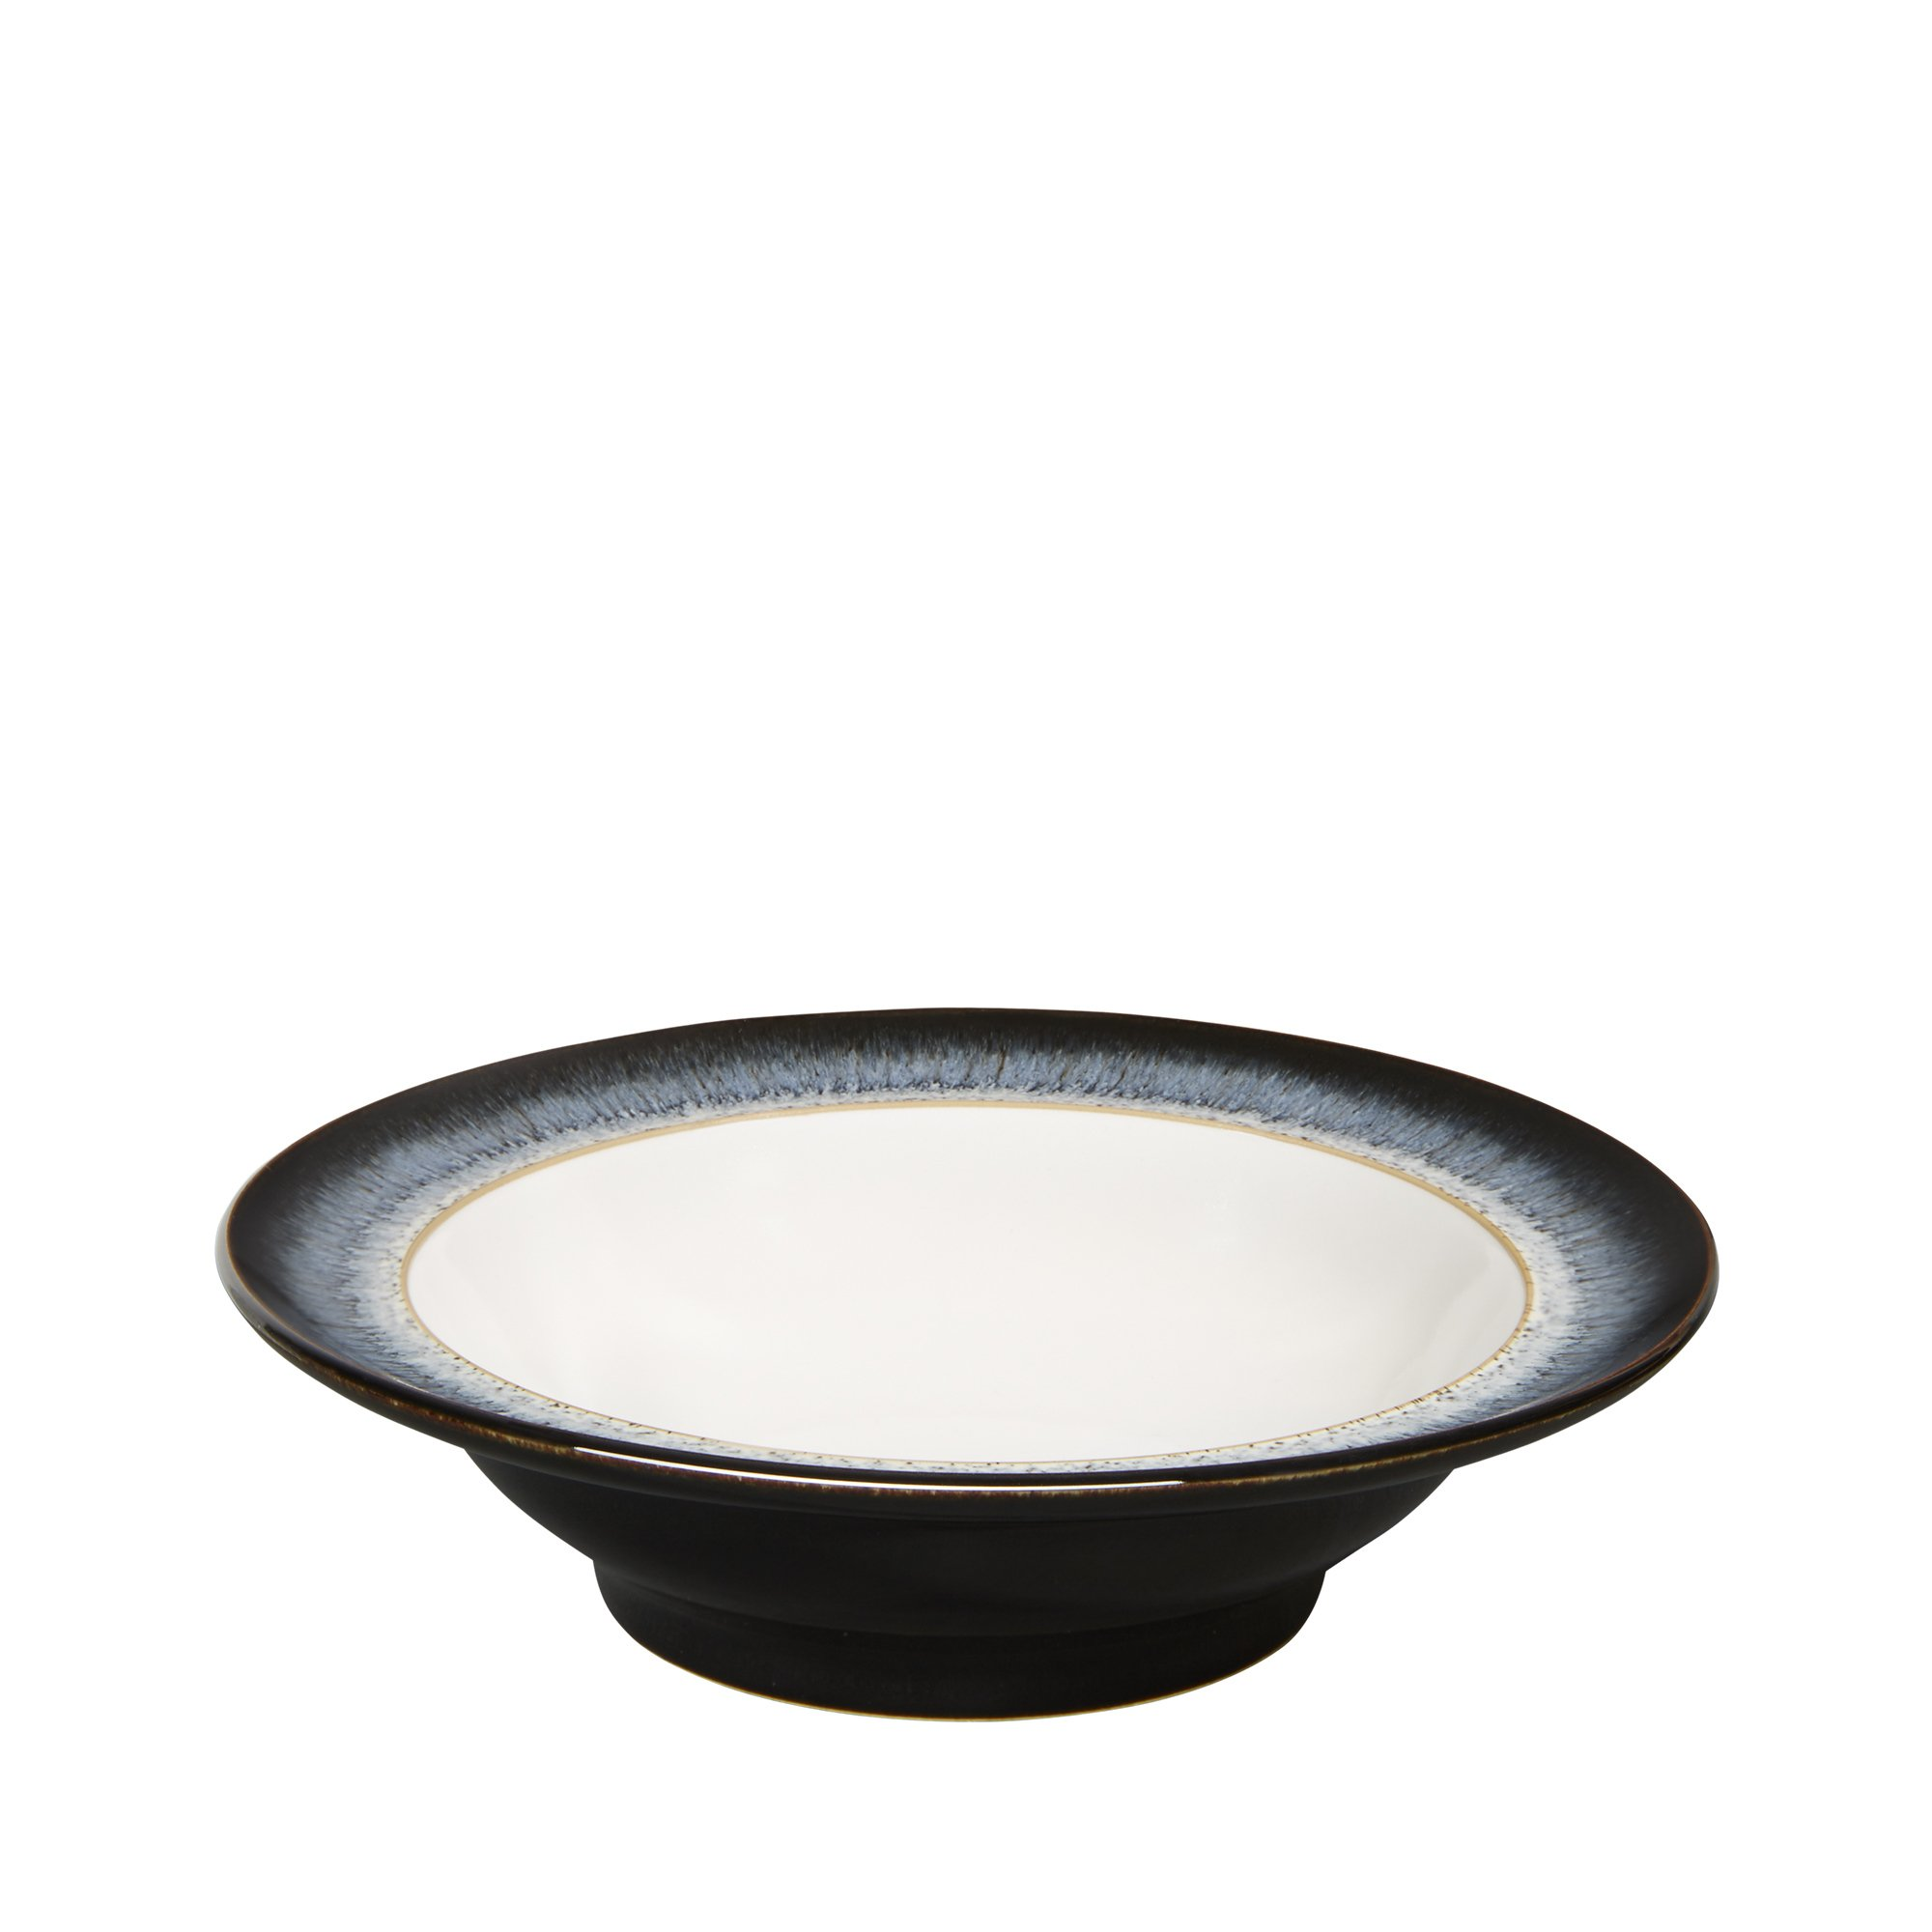 Denby Halo Ramekin and Wide Rimmed Cereal Bowl, Set of 5